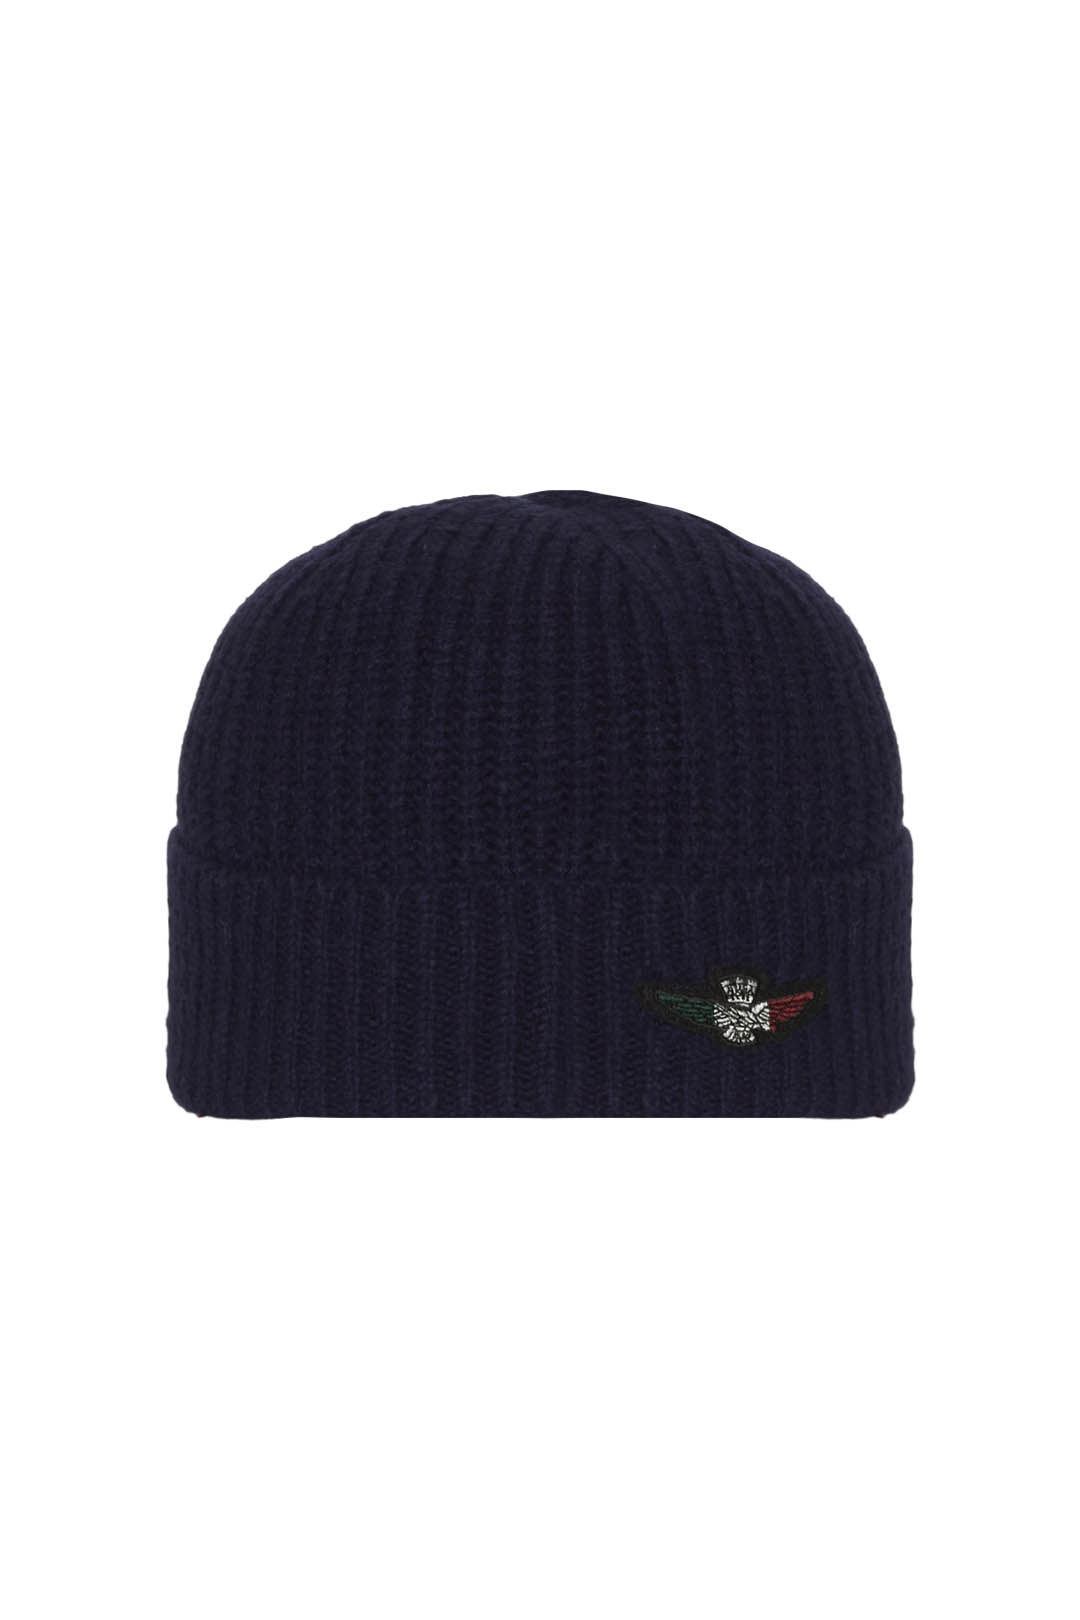 Knit cap with tricolor eagle patch       2